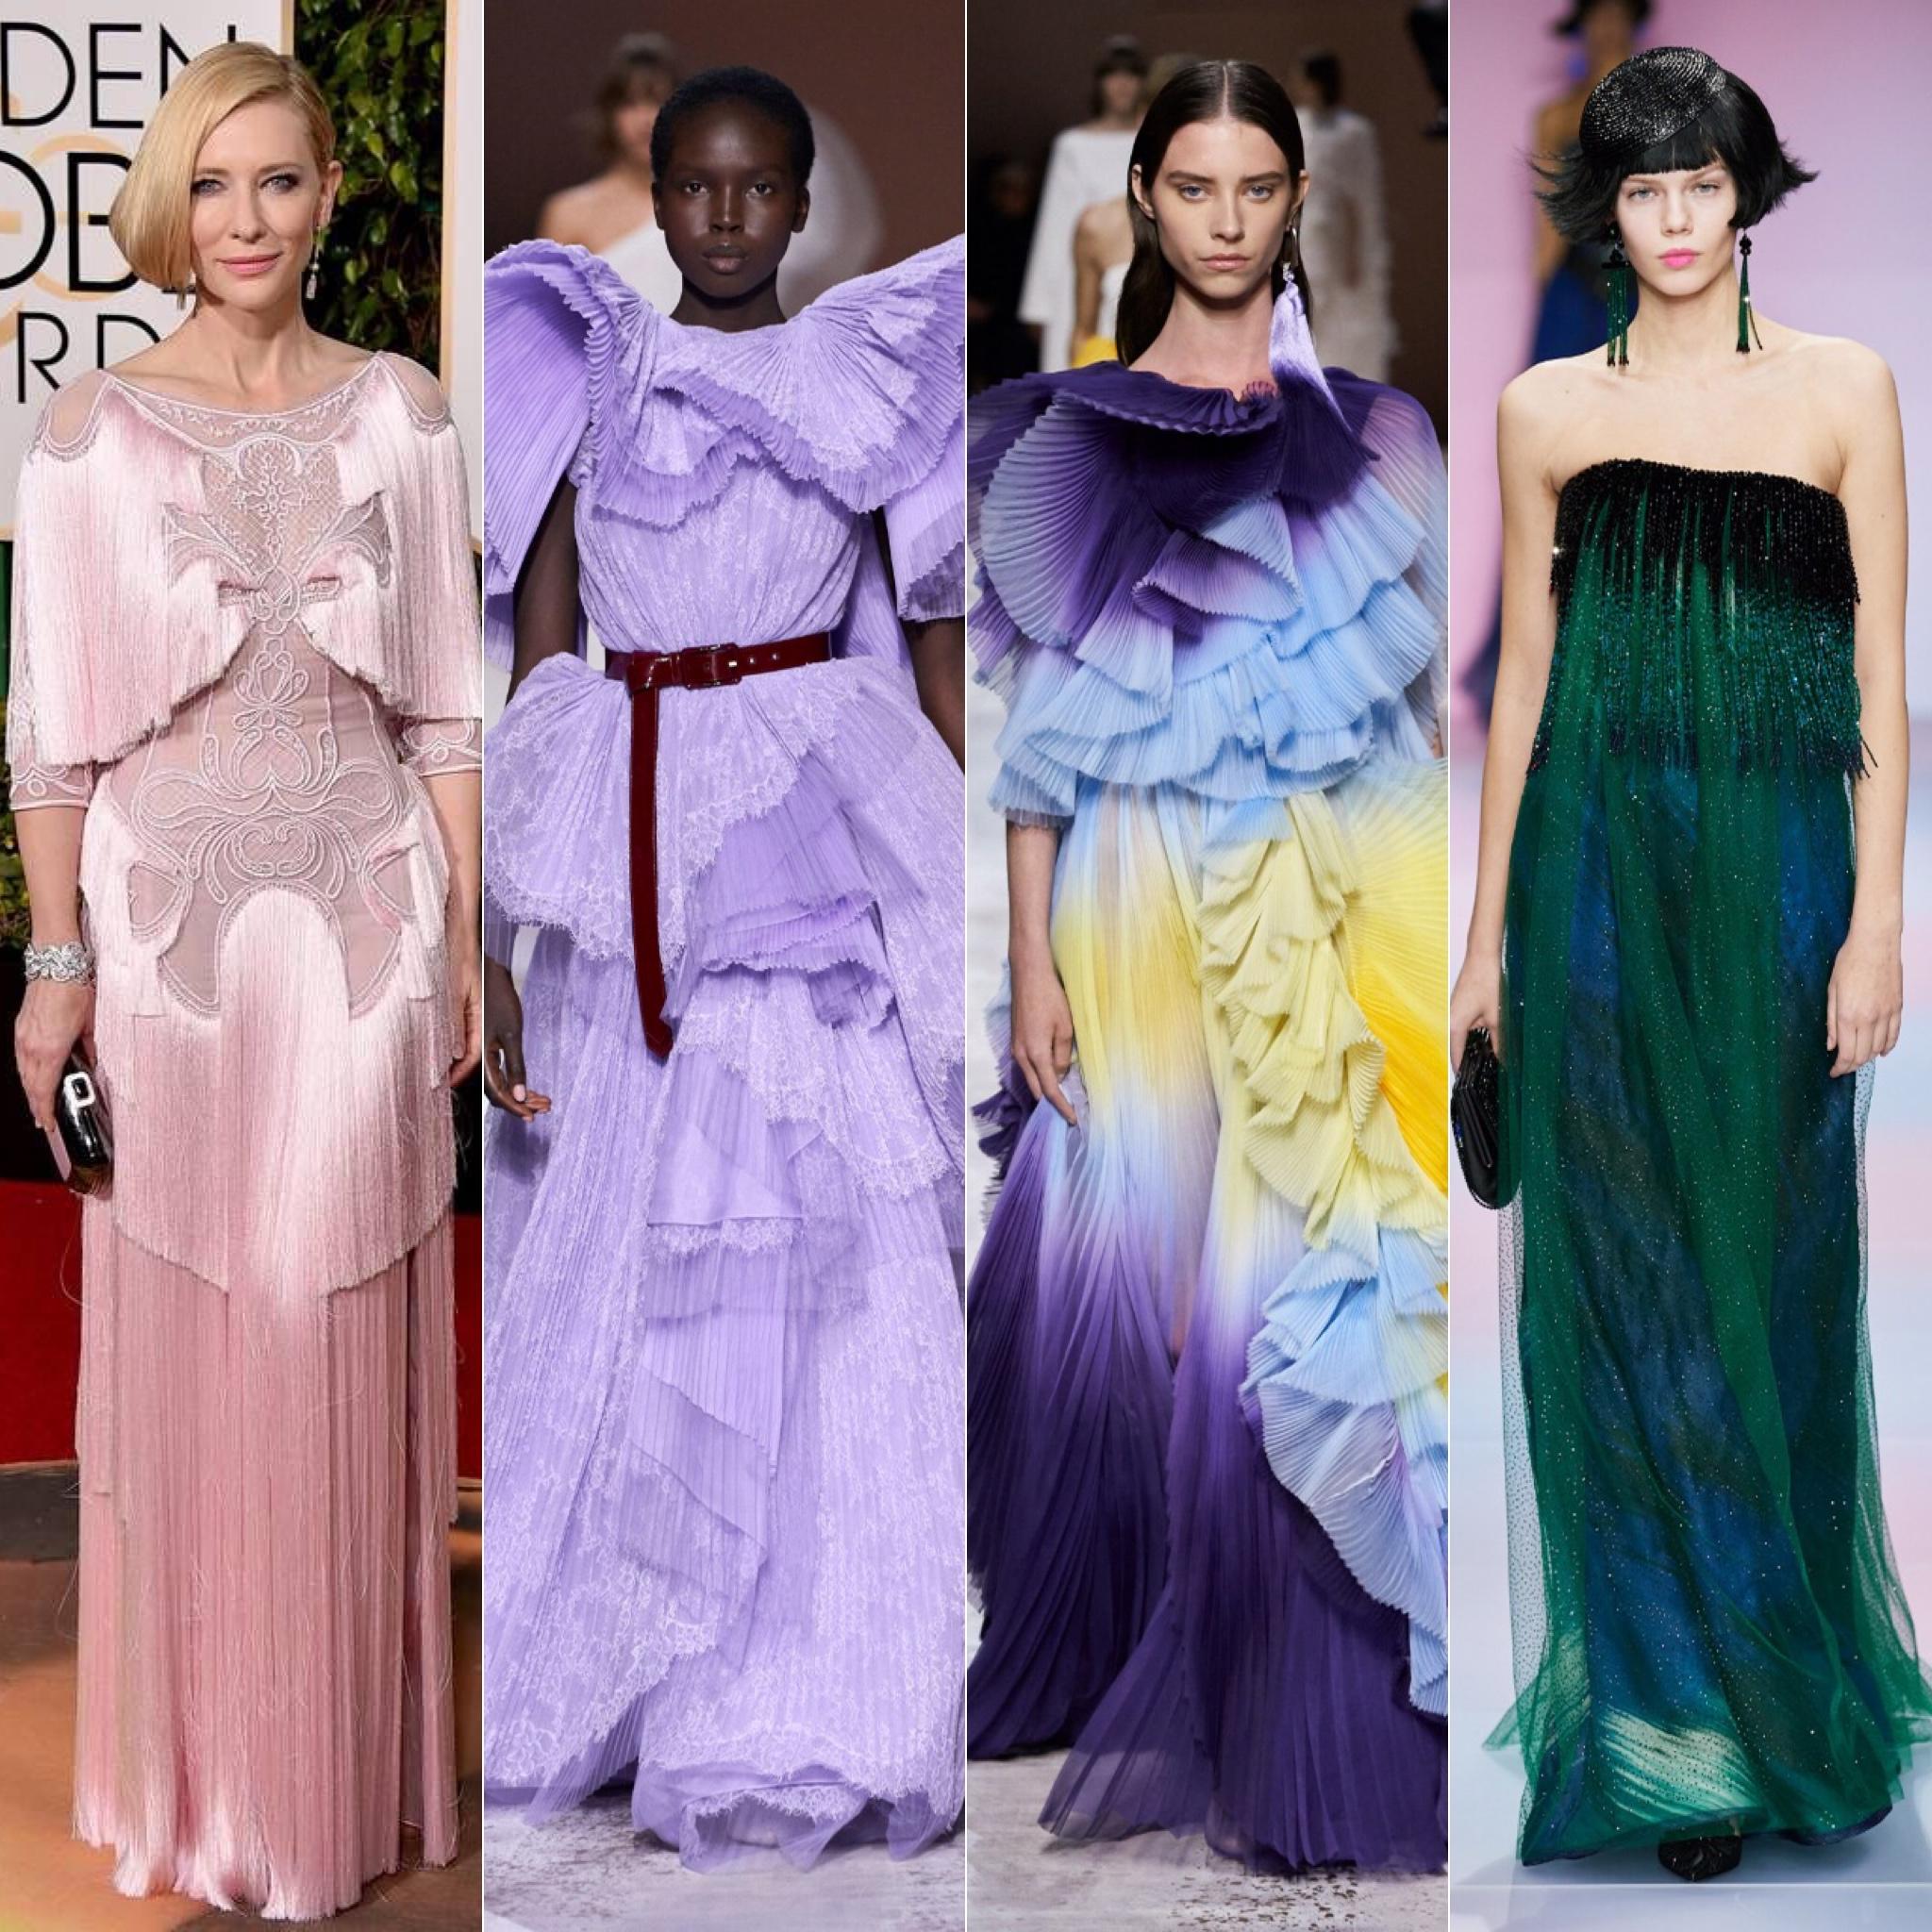 Cate Blanchett; em seguida dois looks da Valentino e um vestido da Armani Privé / Cortesia